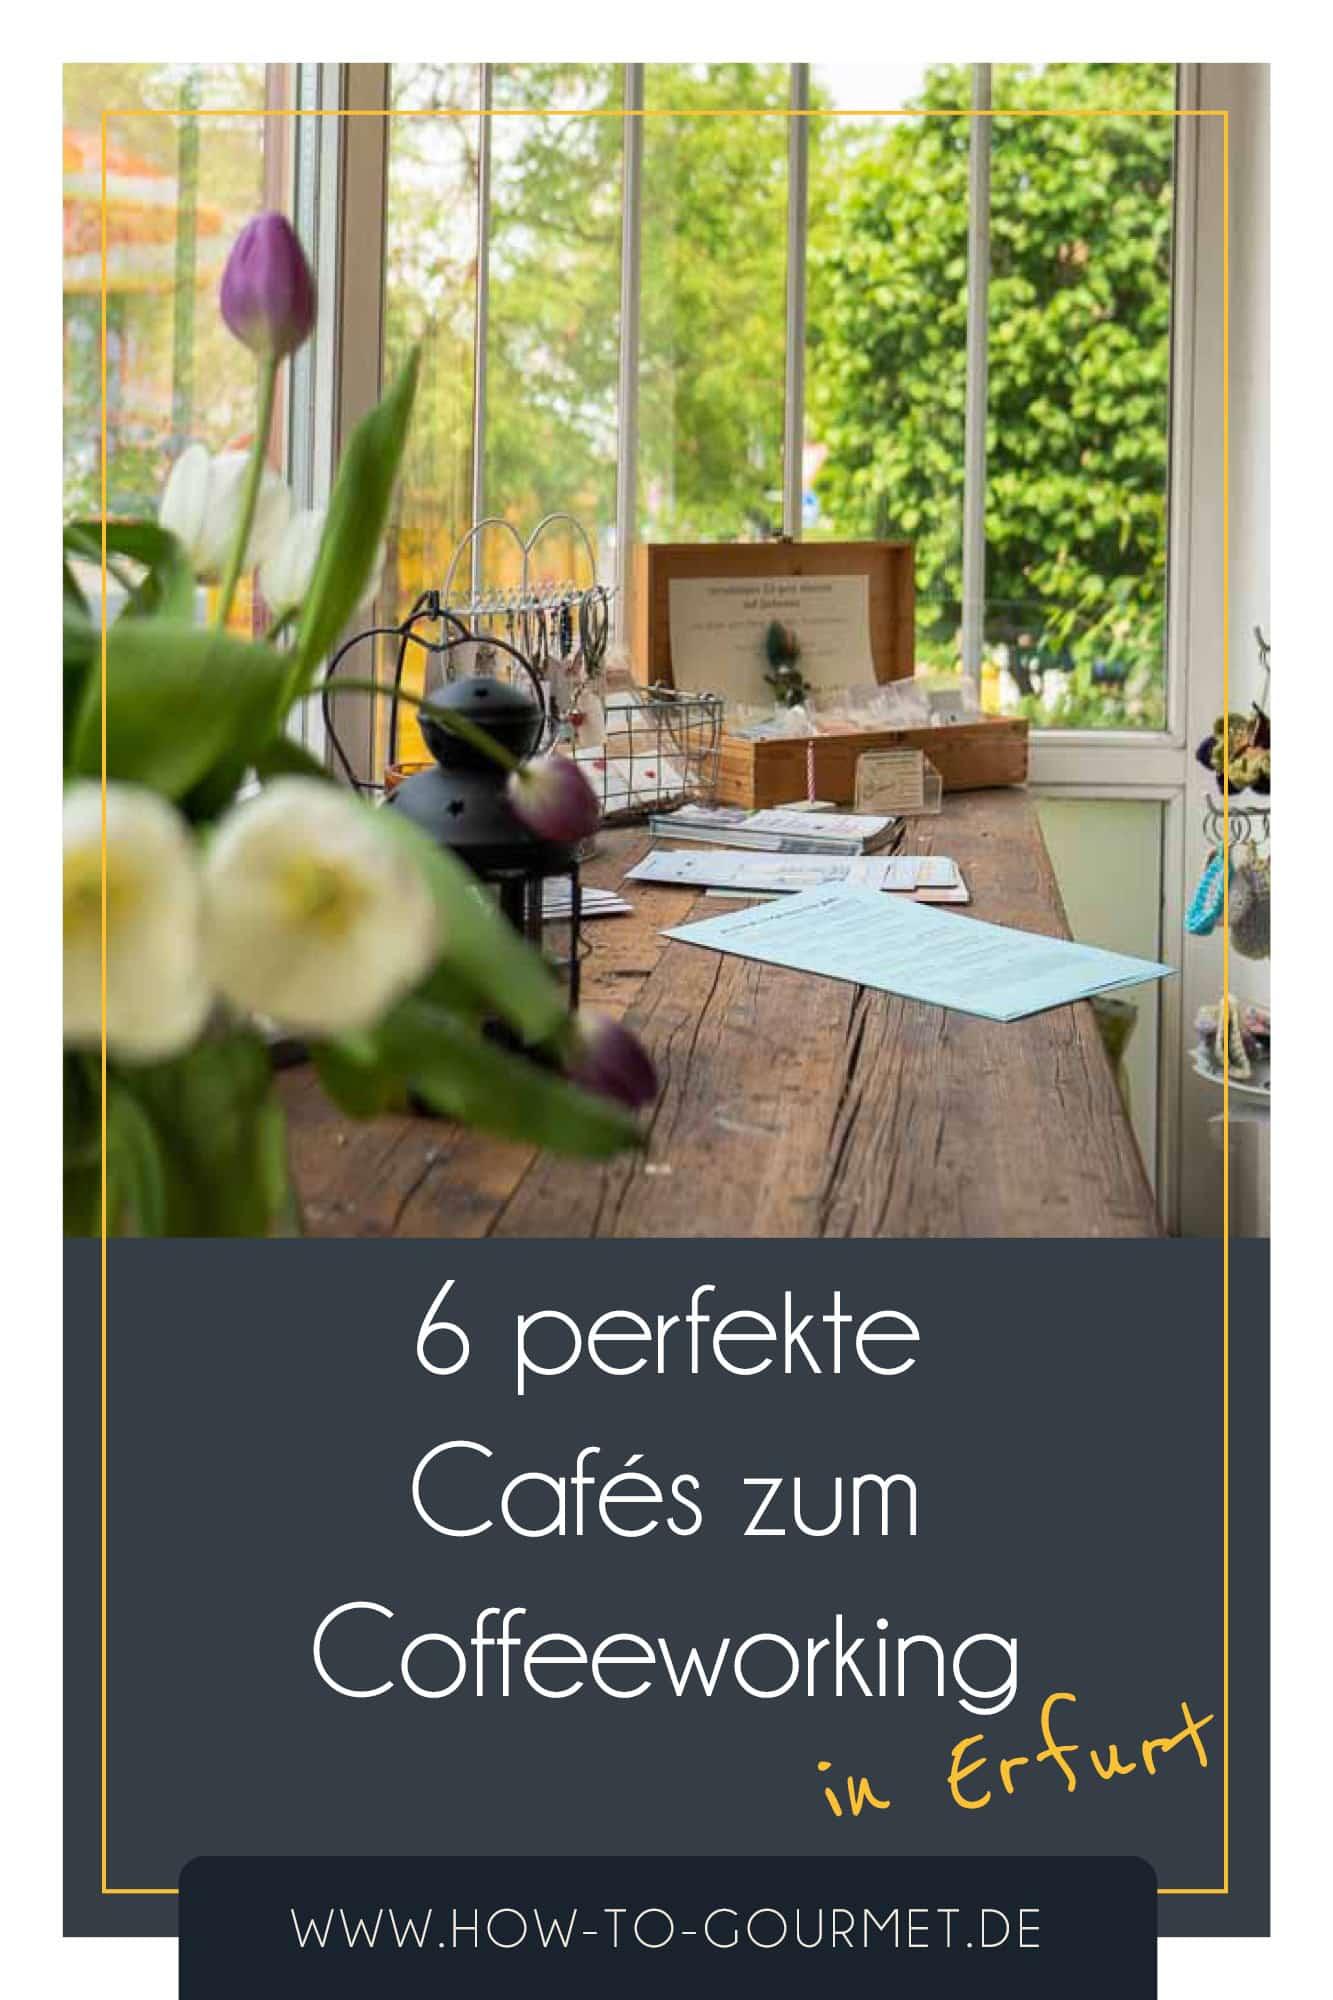 erfurt arbeiten cafe